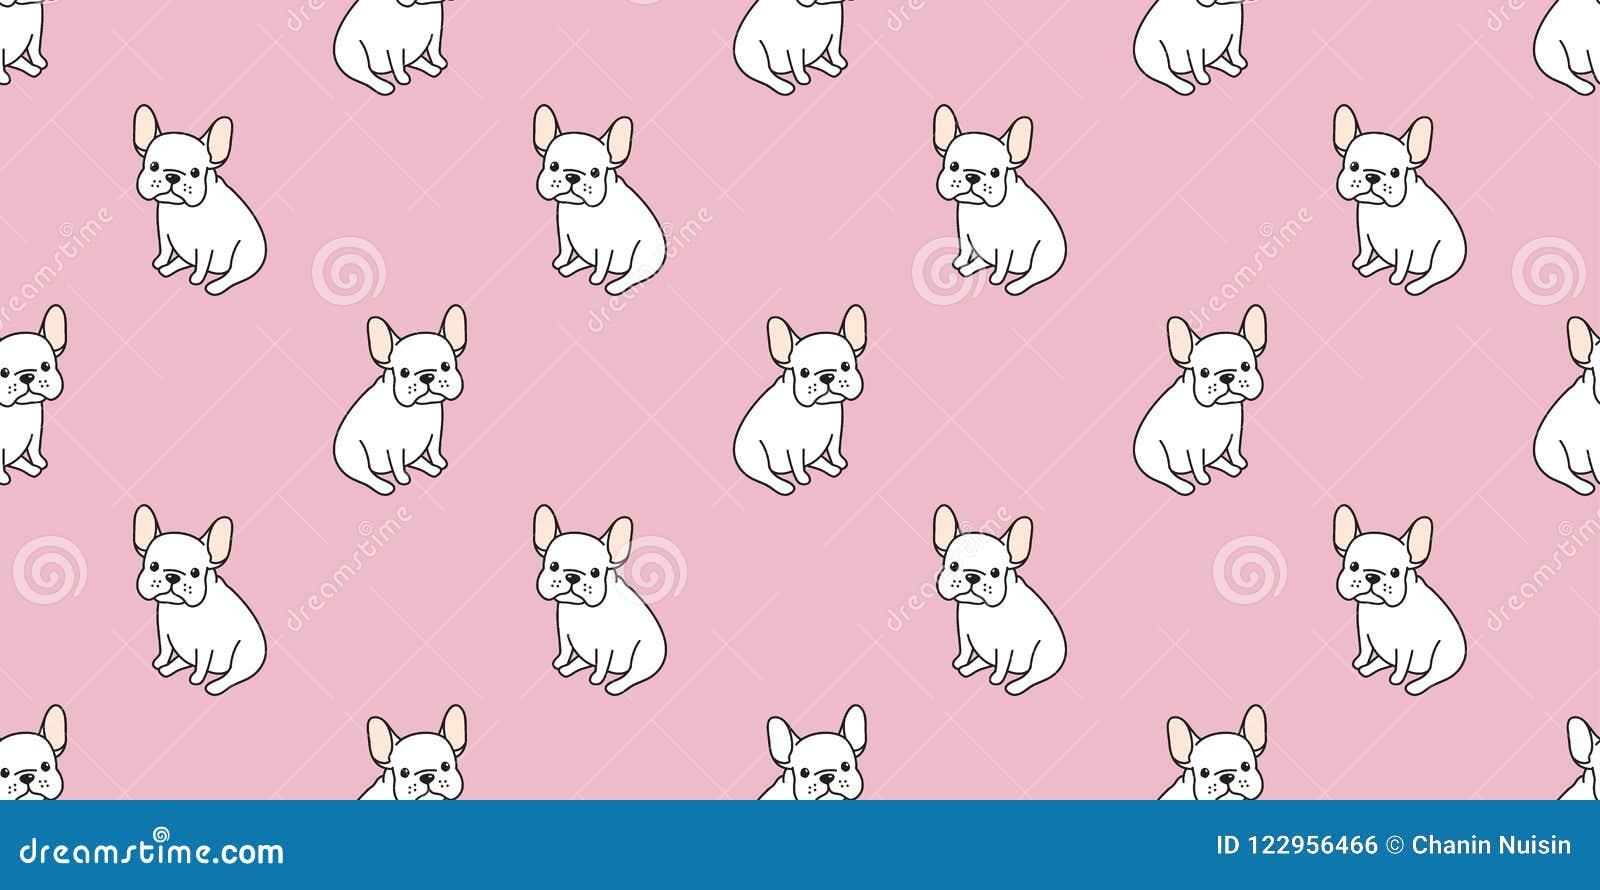 Dog Seamless Pattern French Bulldog Pug Sit Isolated